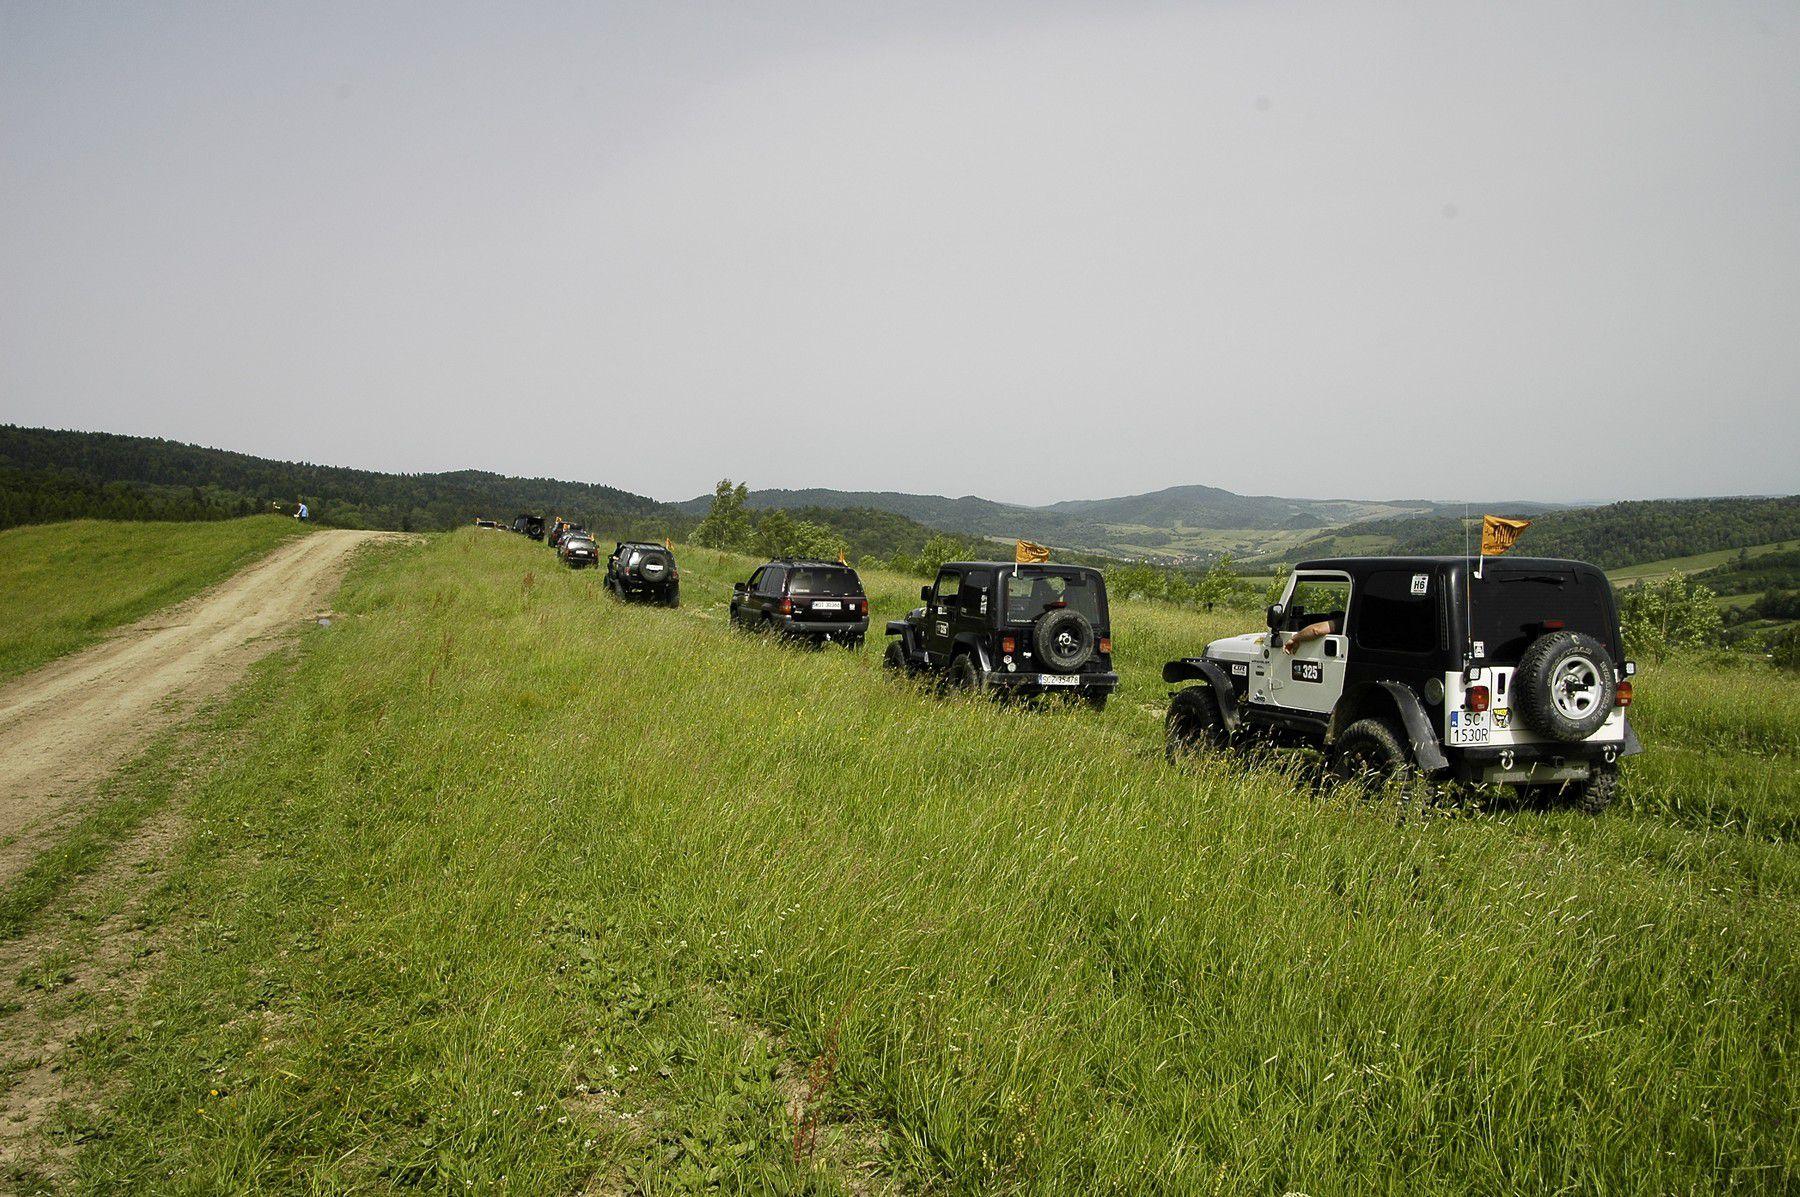 Camp Jeep PL 2016 Smotrawa